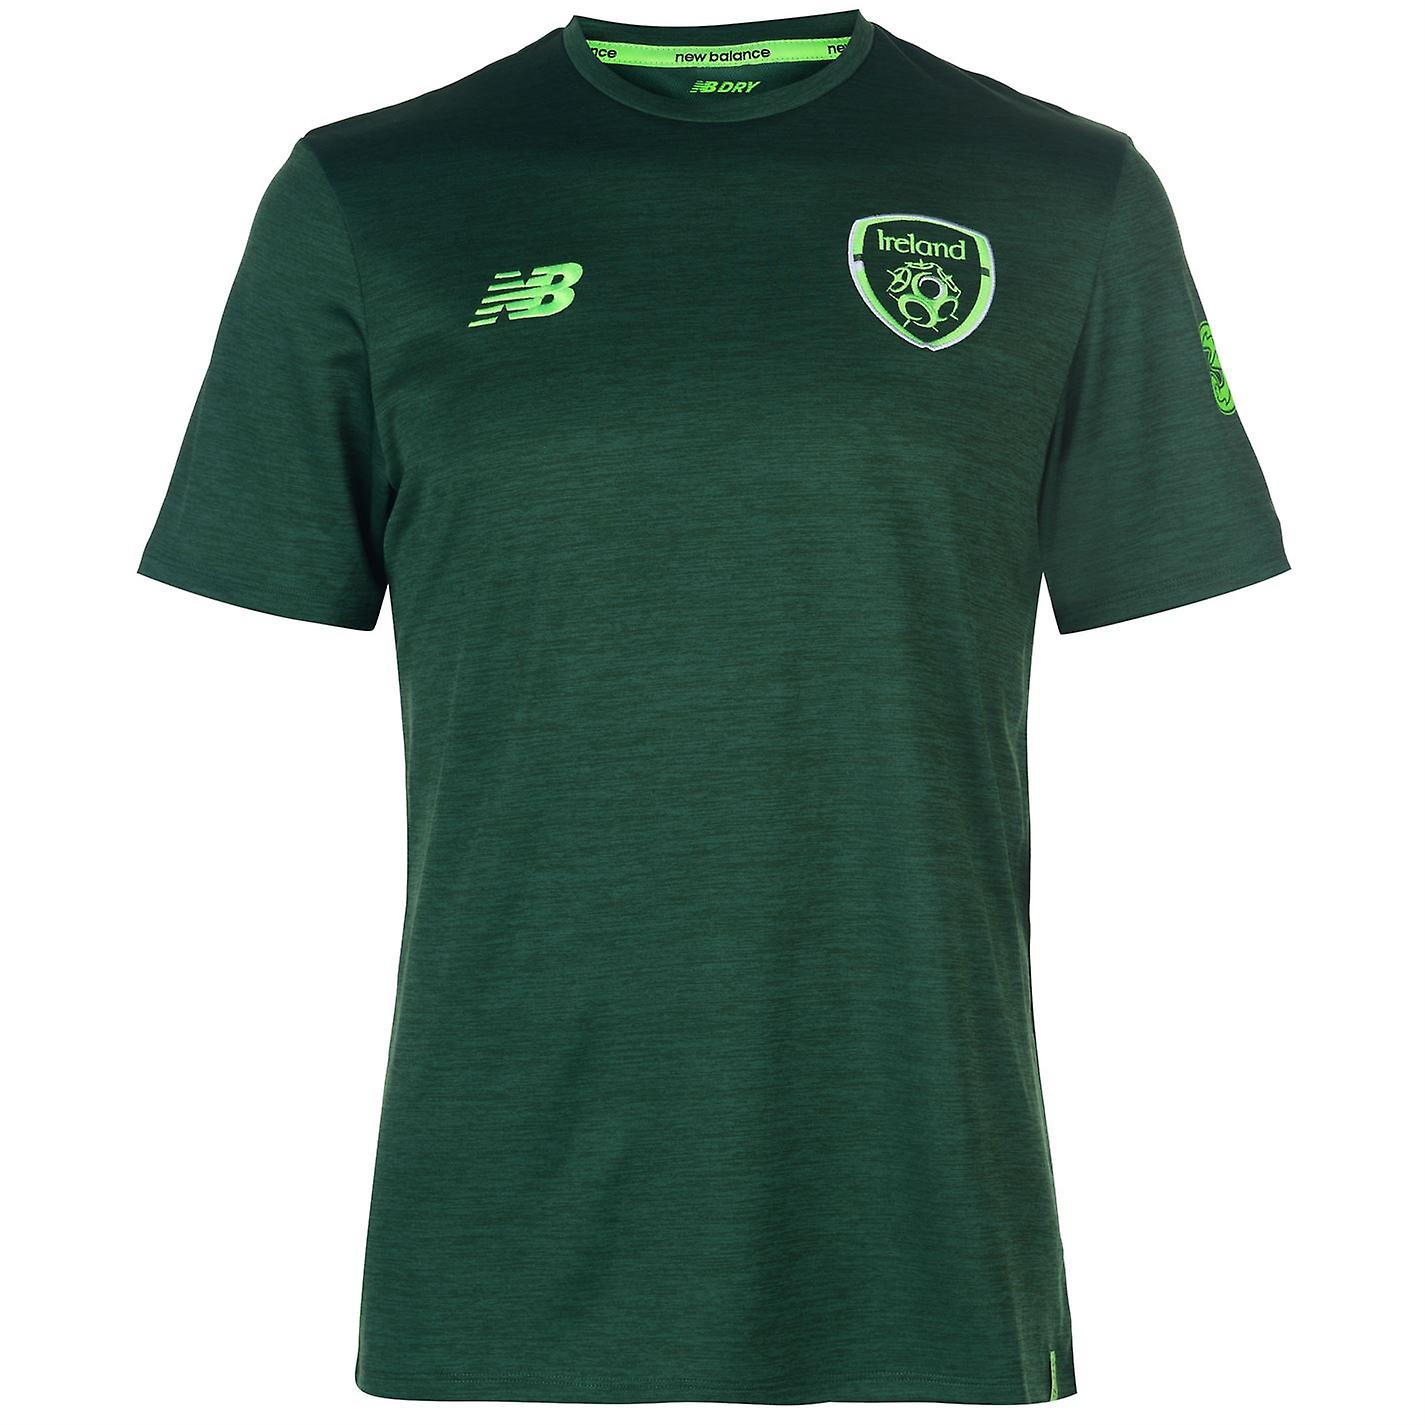 New Balance Mens Ireland Elite T Shirt